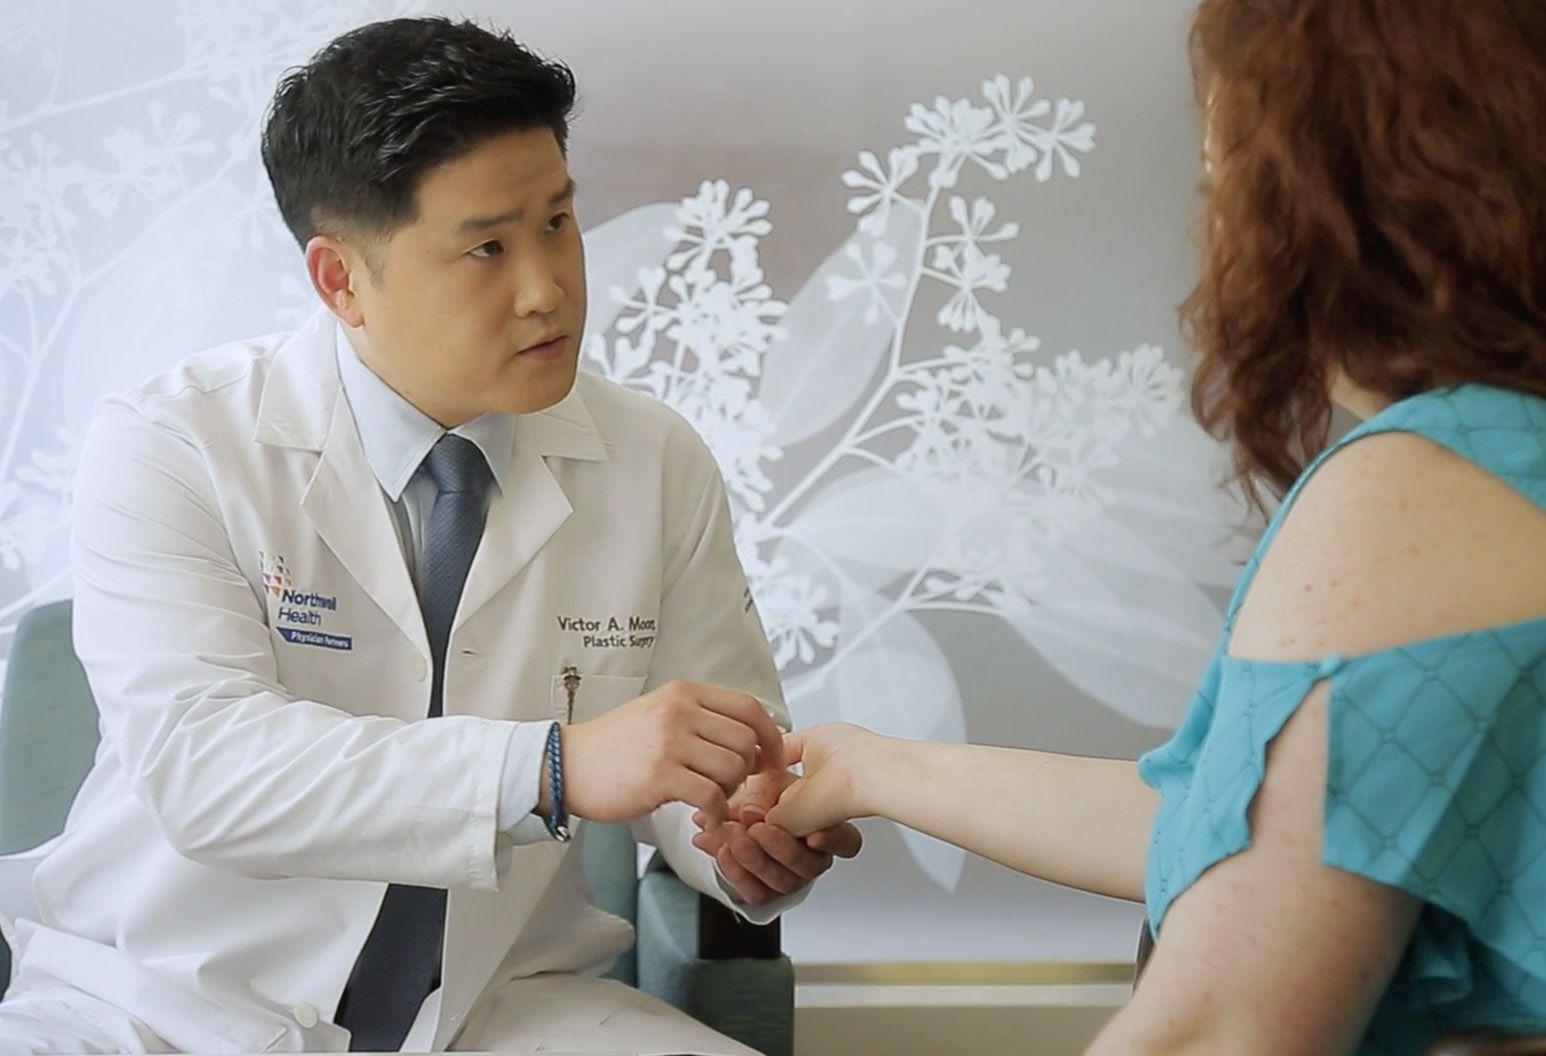 Plastic surgeon examining patients hand